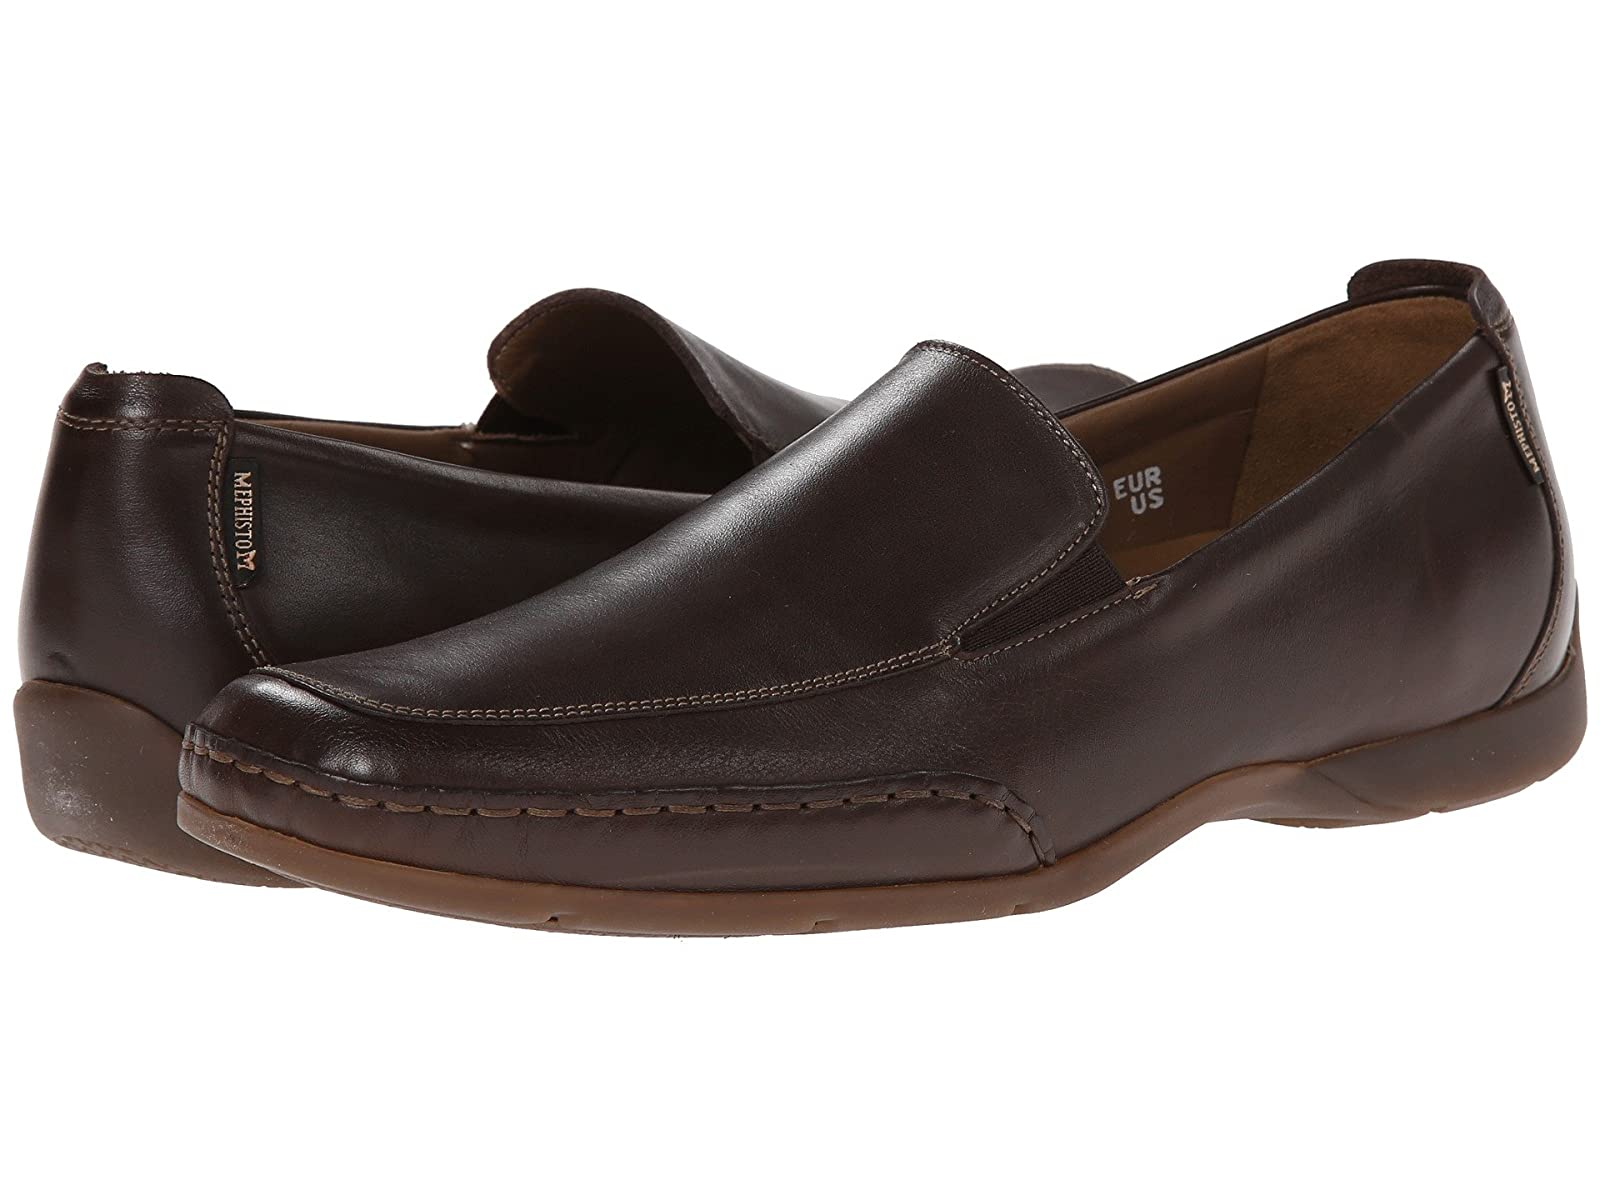 Mephisto EdlefAtmospheric grades have affordable shoes